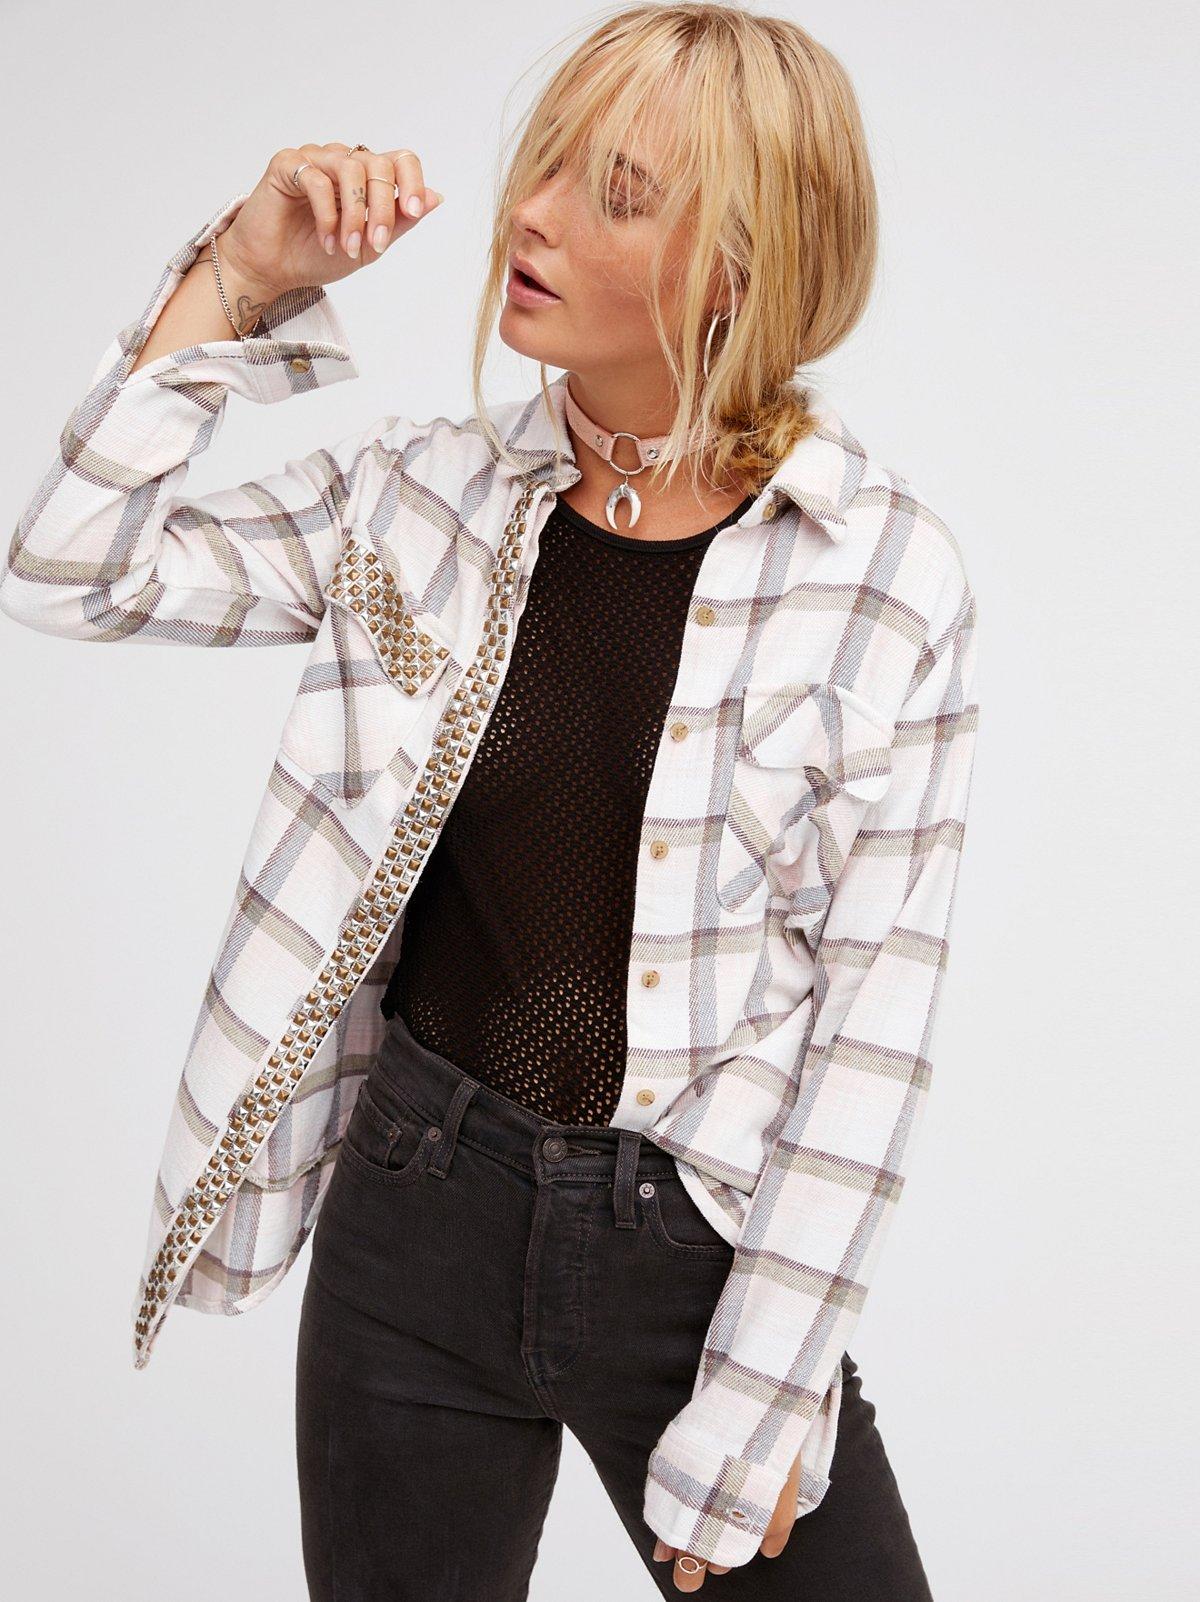 Erin's铆钉格子衬衫